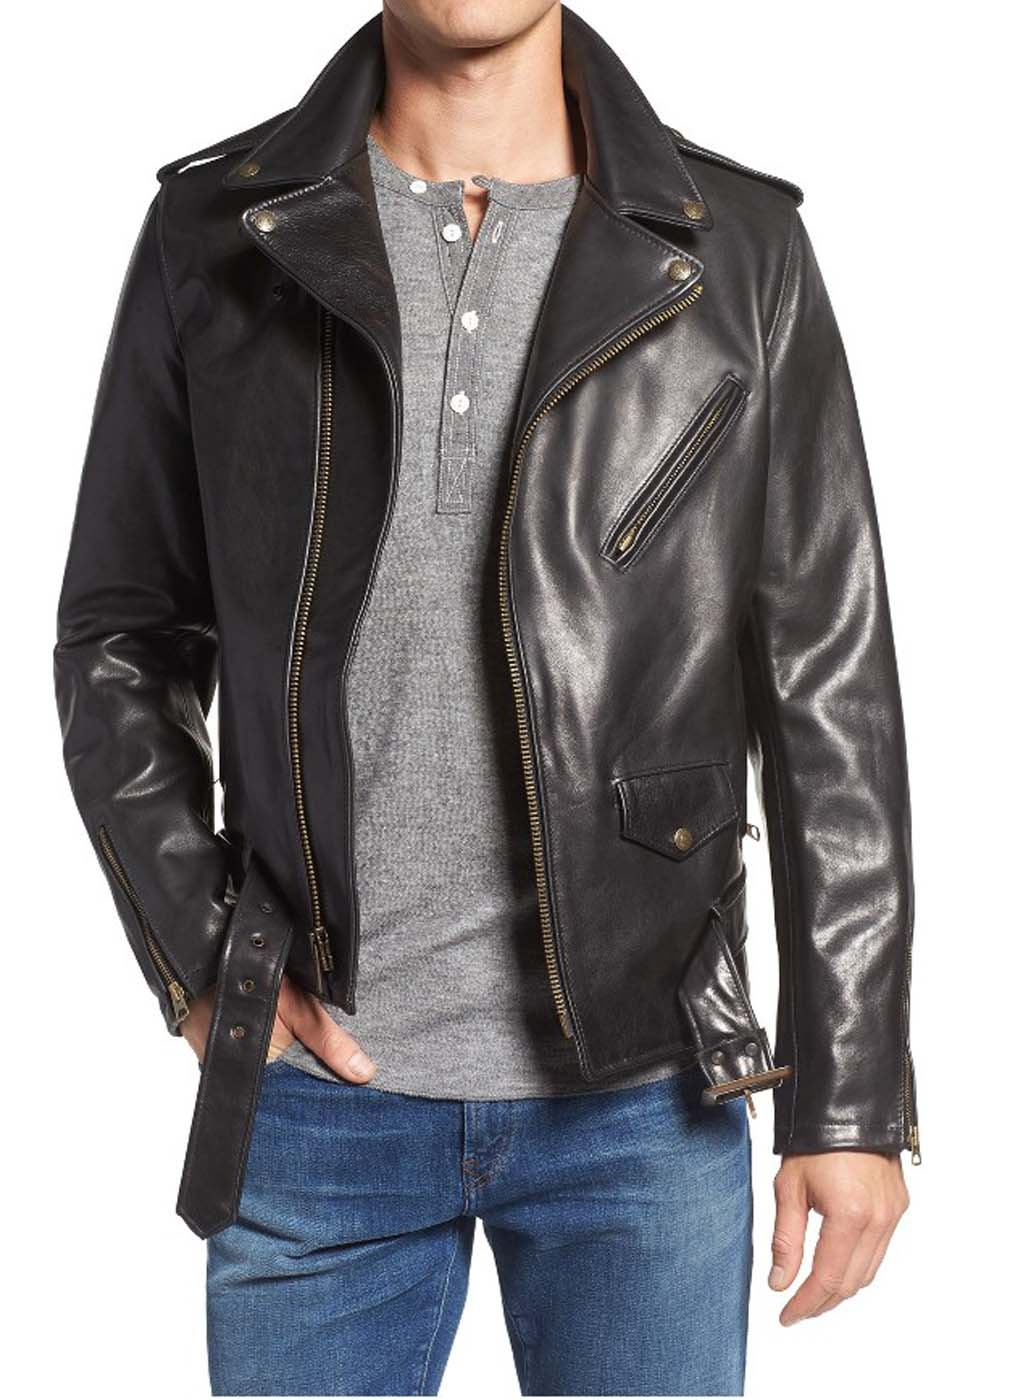 Mens Black Leather Motorcycle Jacket In Uk Canada Usa Australia